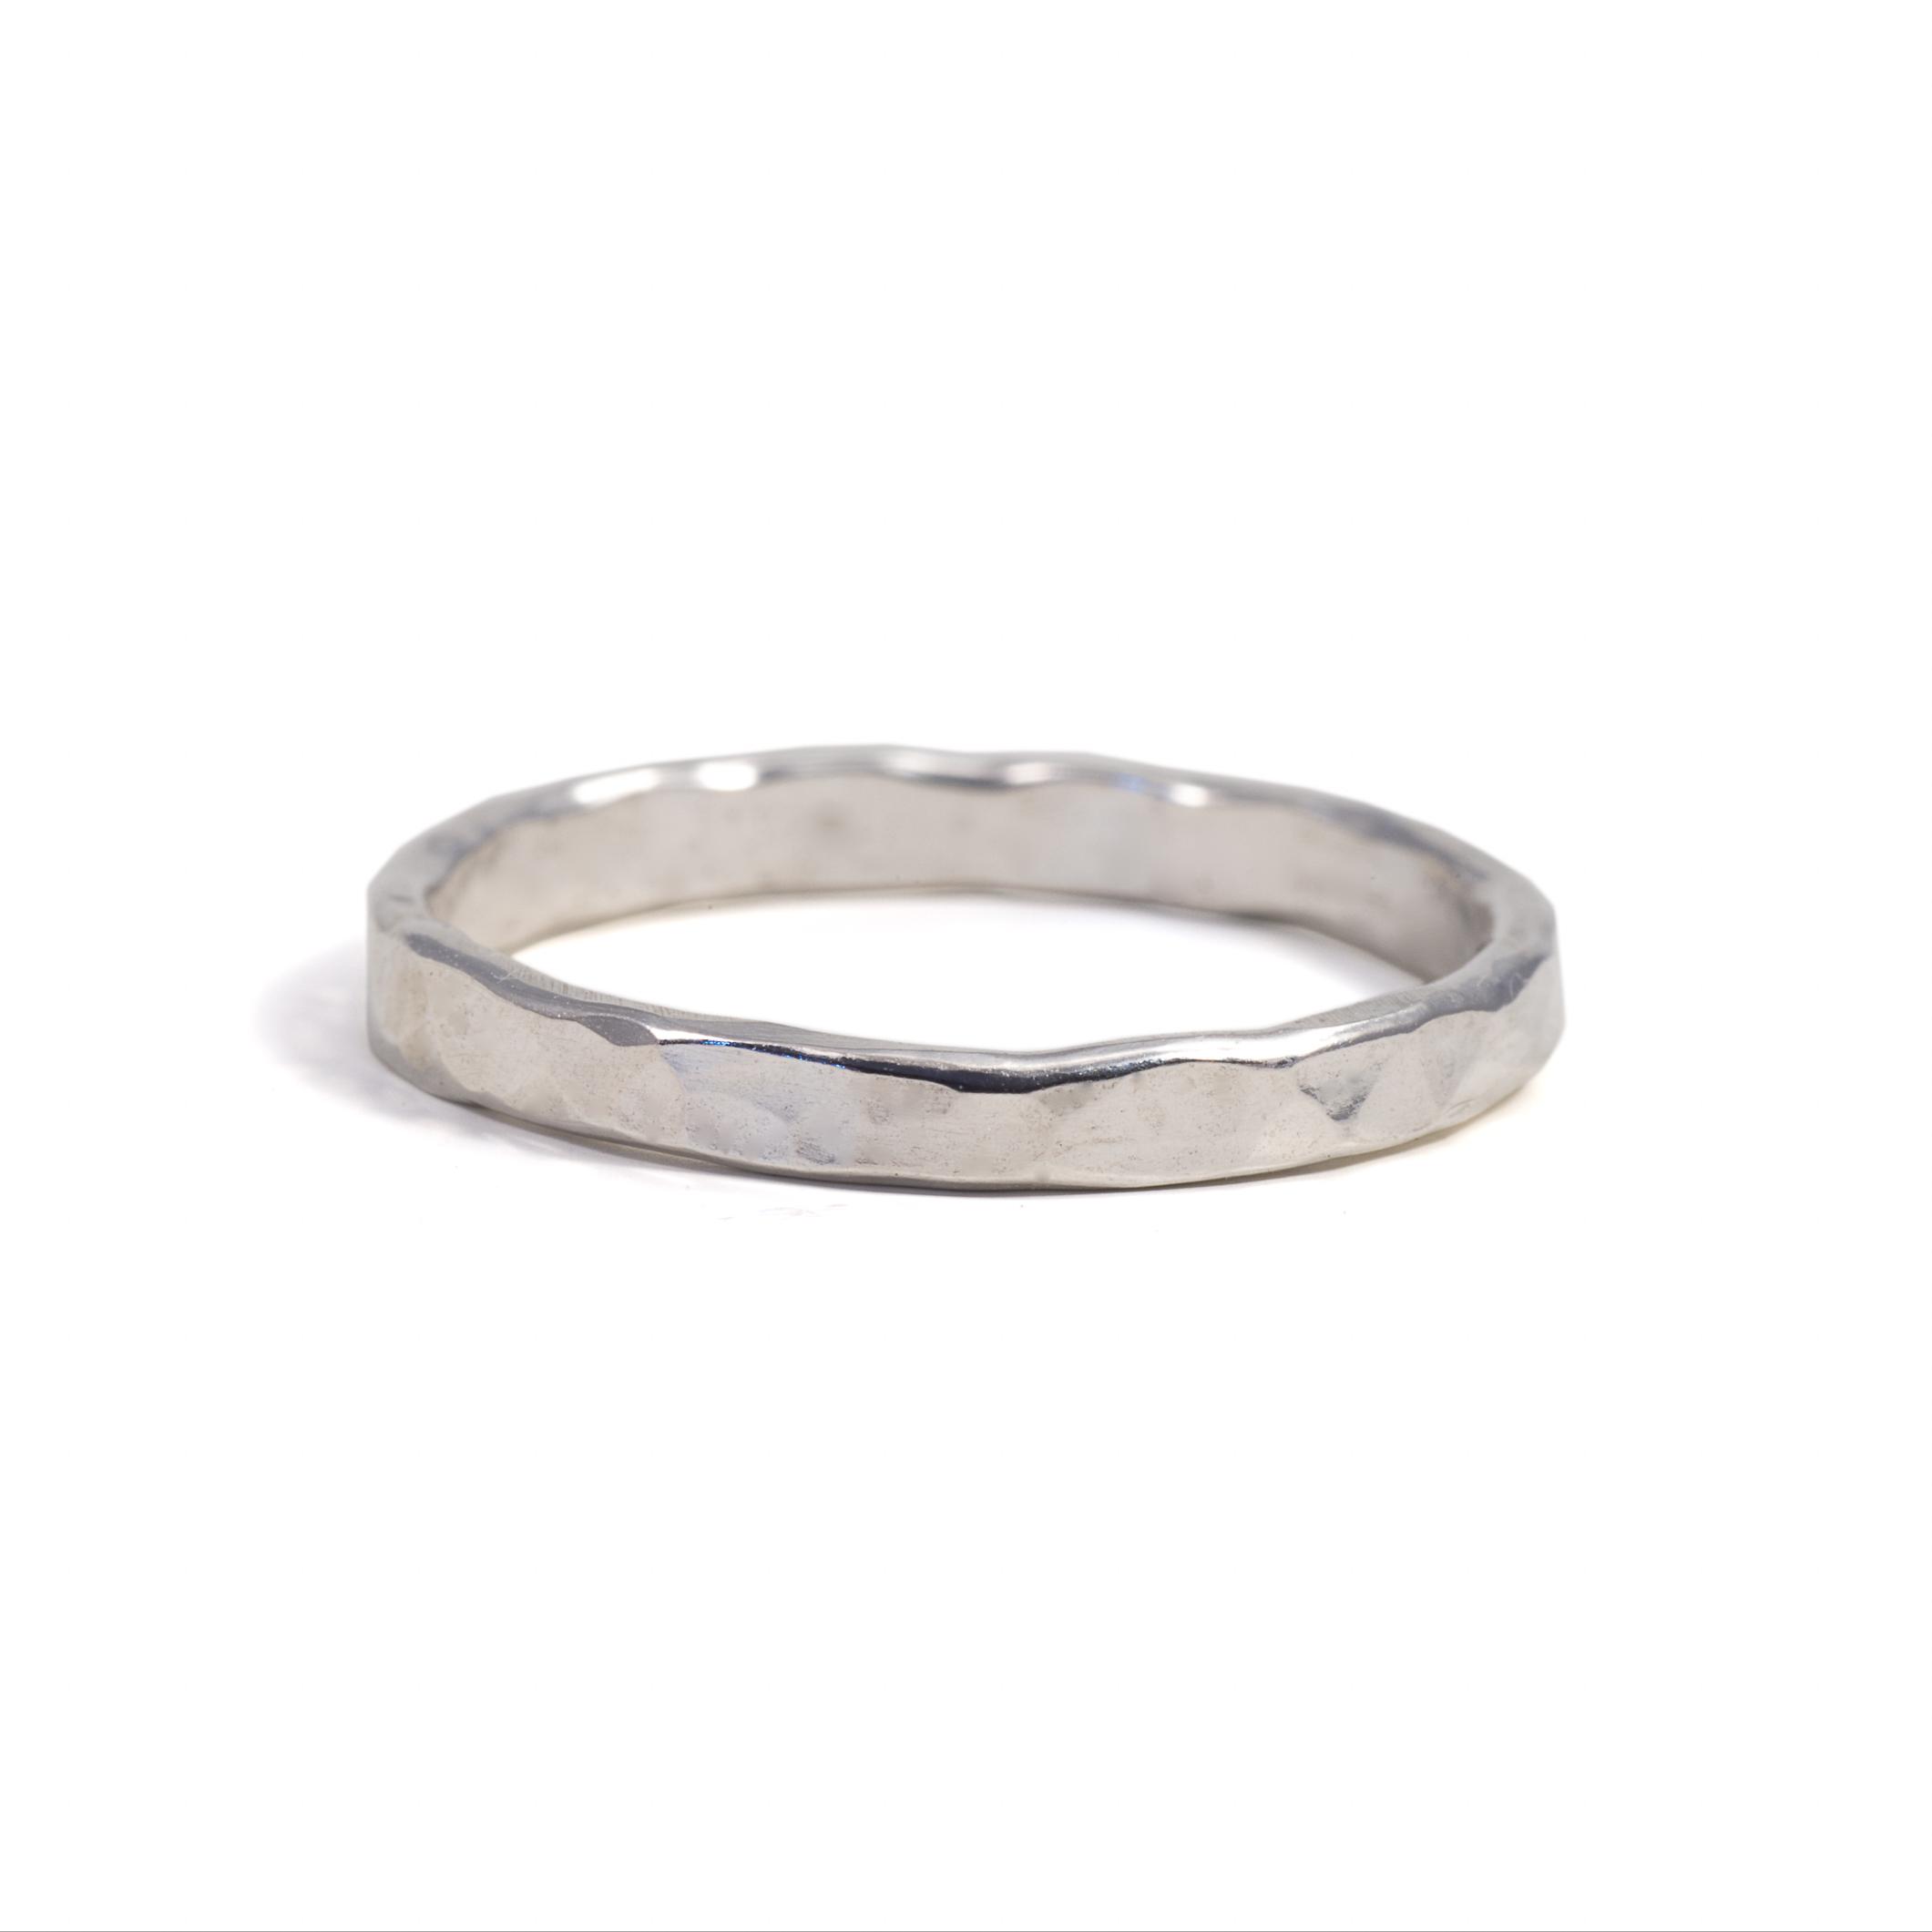 MNOP. Ring 2 mm. Återvunnet silver/ekosilver.